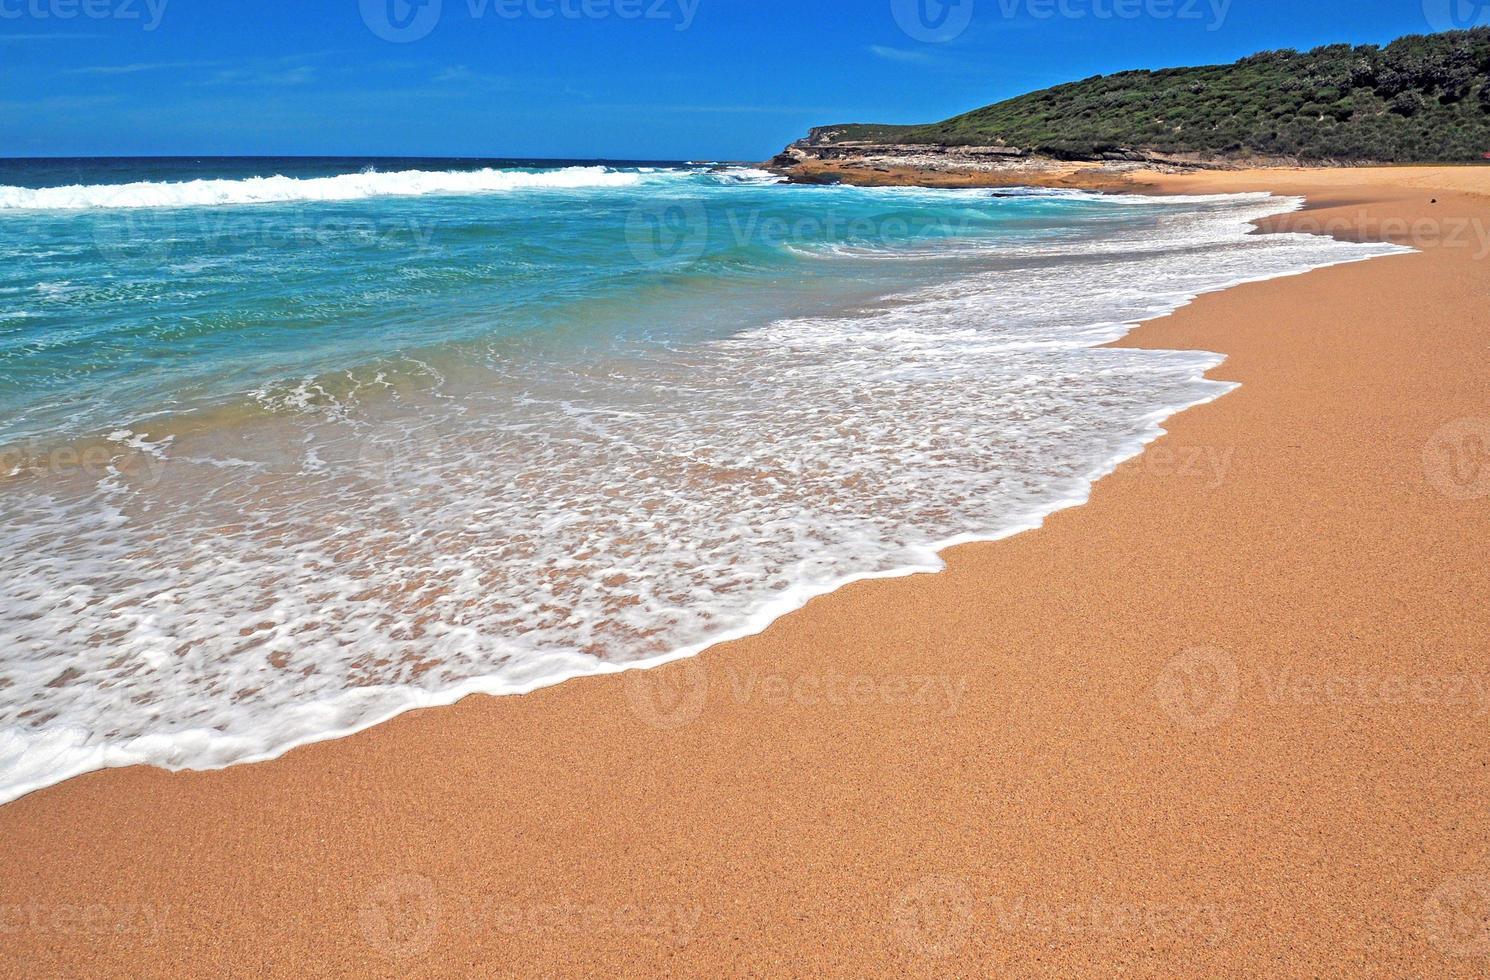 praia intocada isolada perto de sydney, nsw austrália foto